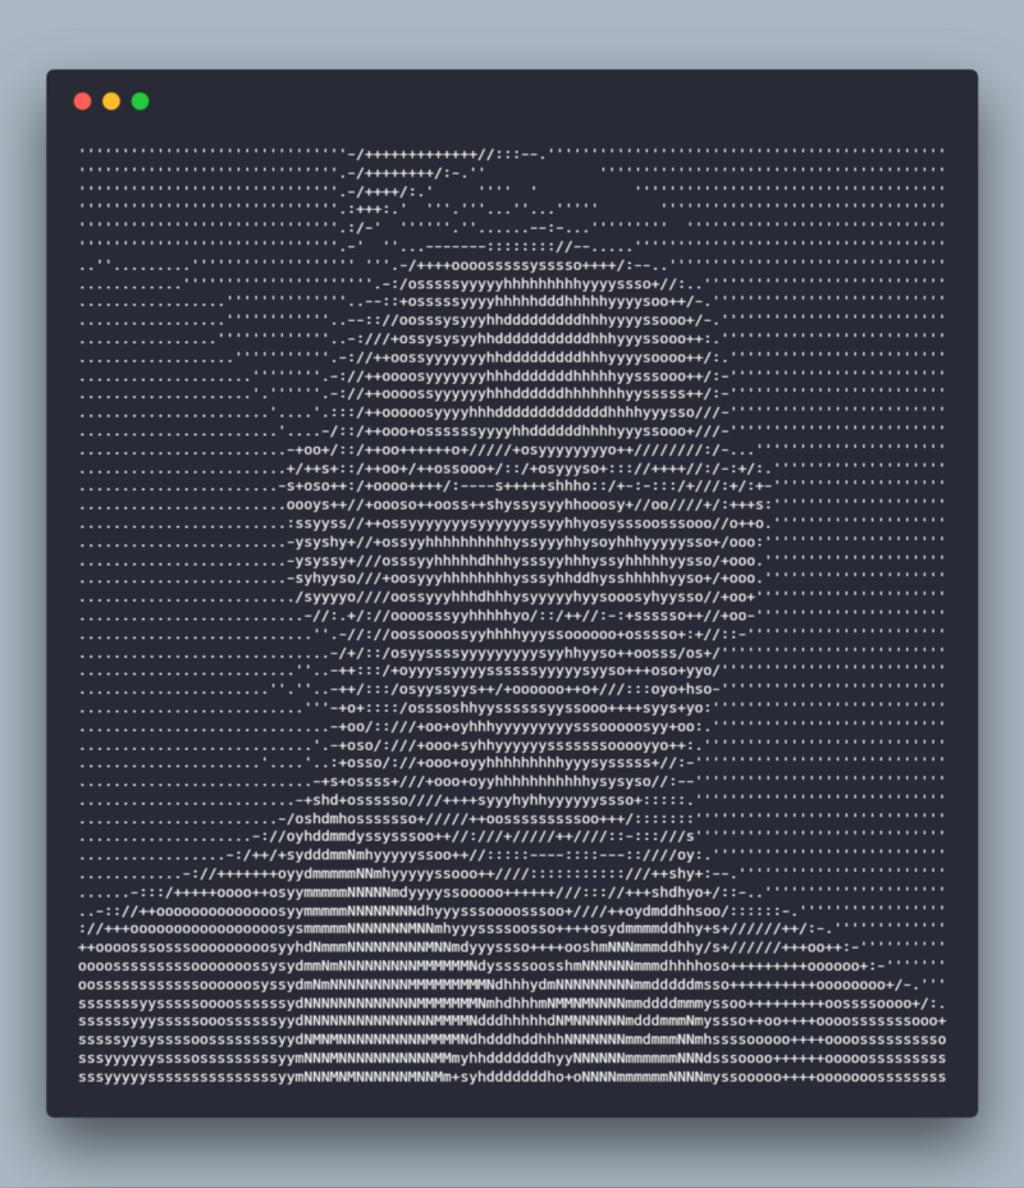 John Cena's beautiful face in ASCII art